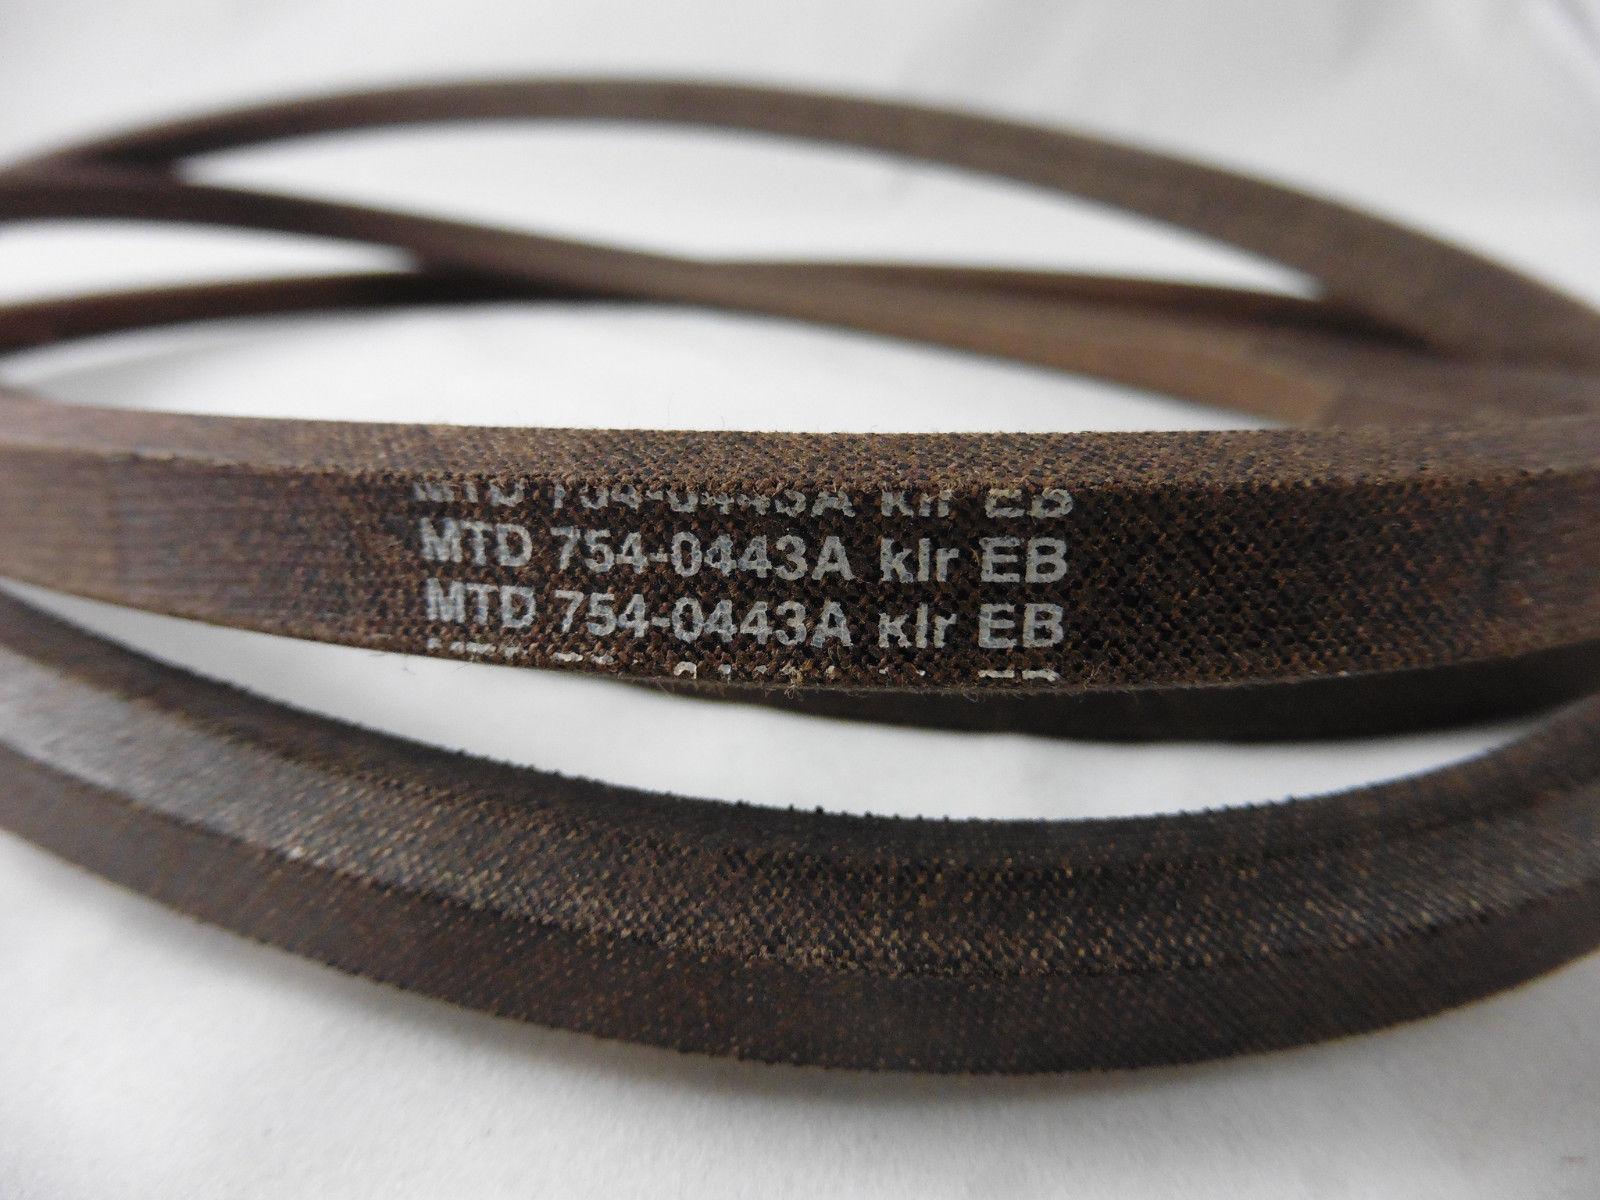 passend MTD Keilriemen Rasentraktor Mähdeckantrieb 754-0443A 6-kant AA 88 102cm